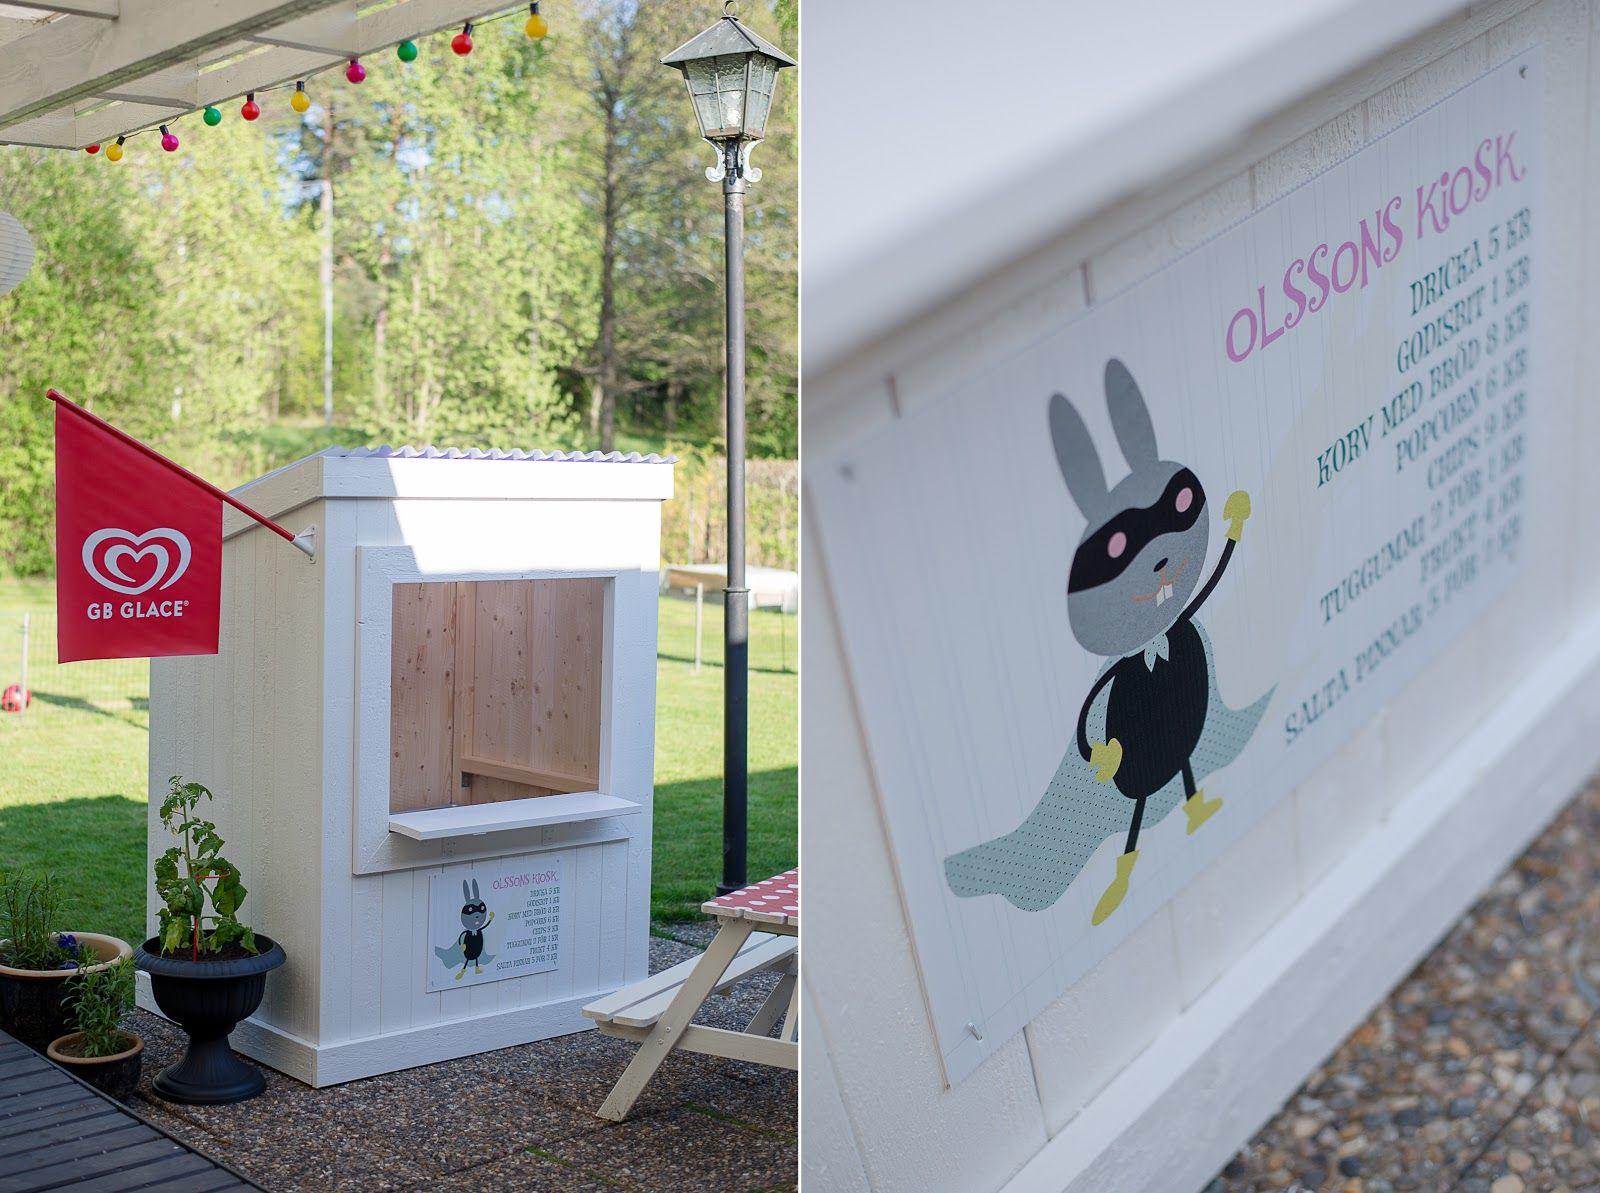 Kiosk / Lekstuga | Hos mig | Pinterest | Kiosk, Barn and Playhouses